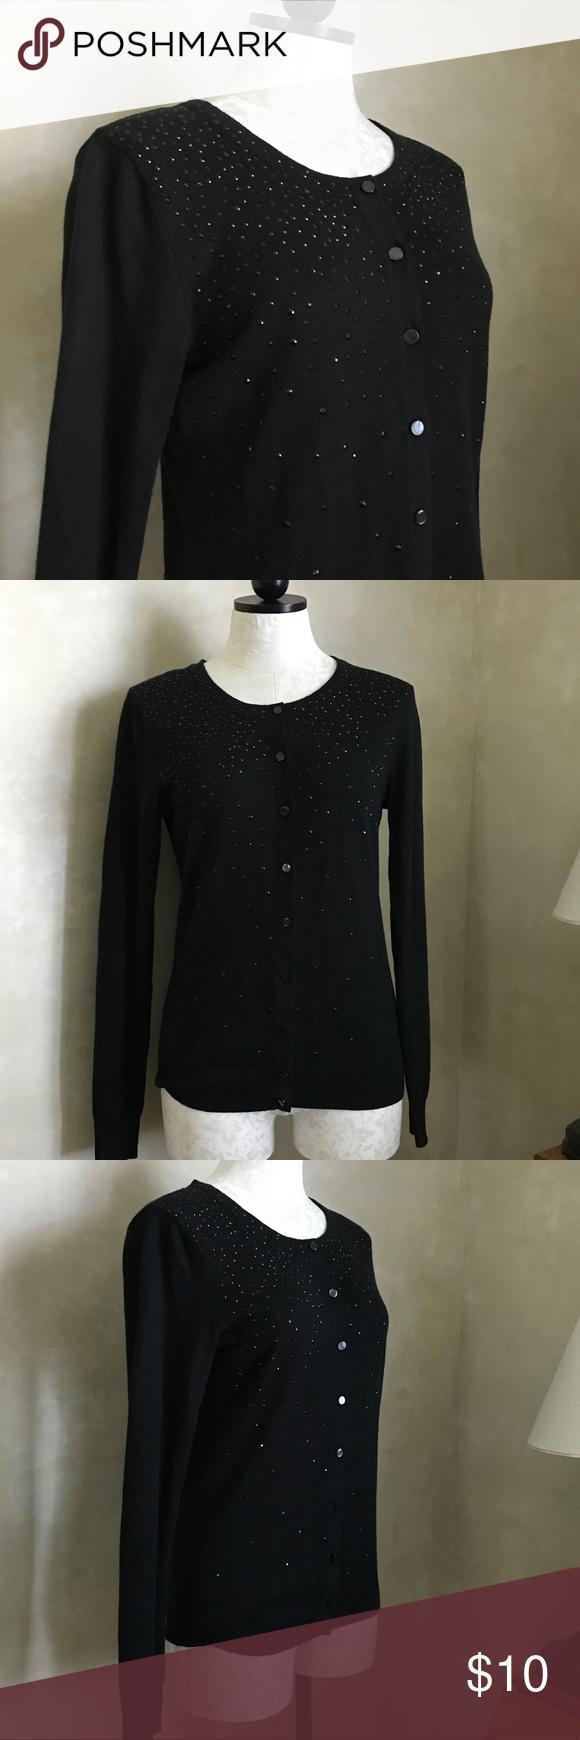 Merona Black Beaded Cardigan Sweater Sz Small | Beads and 21st